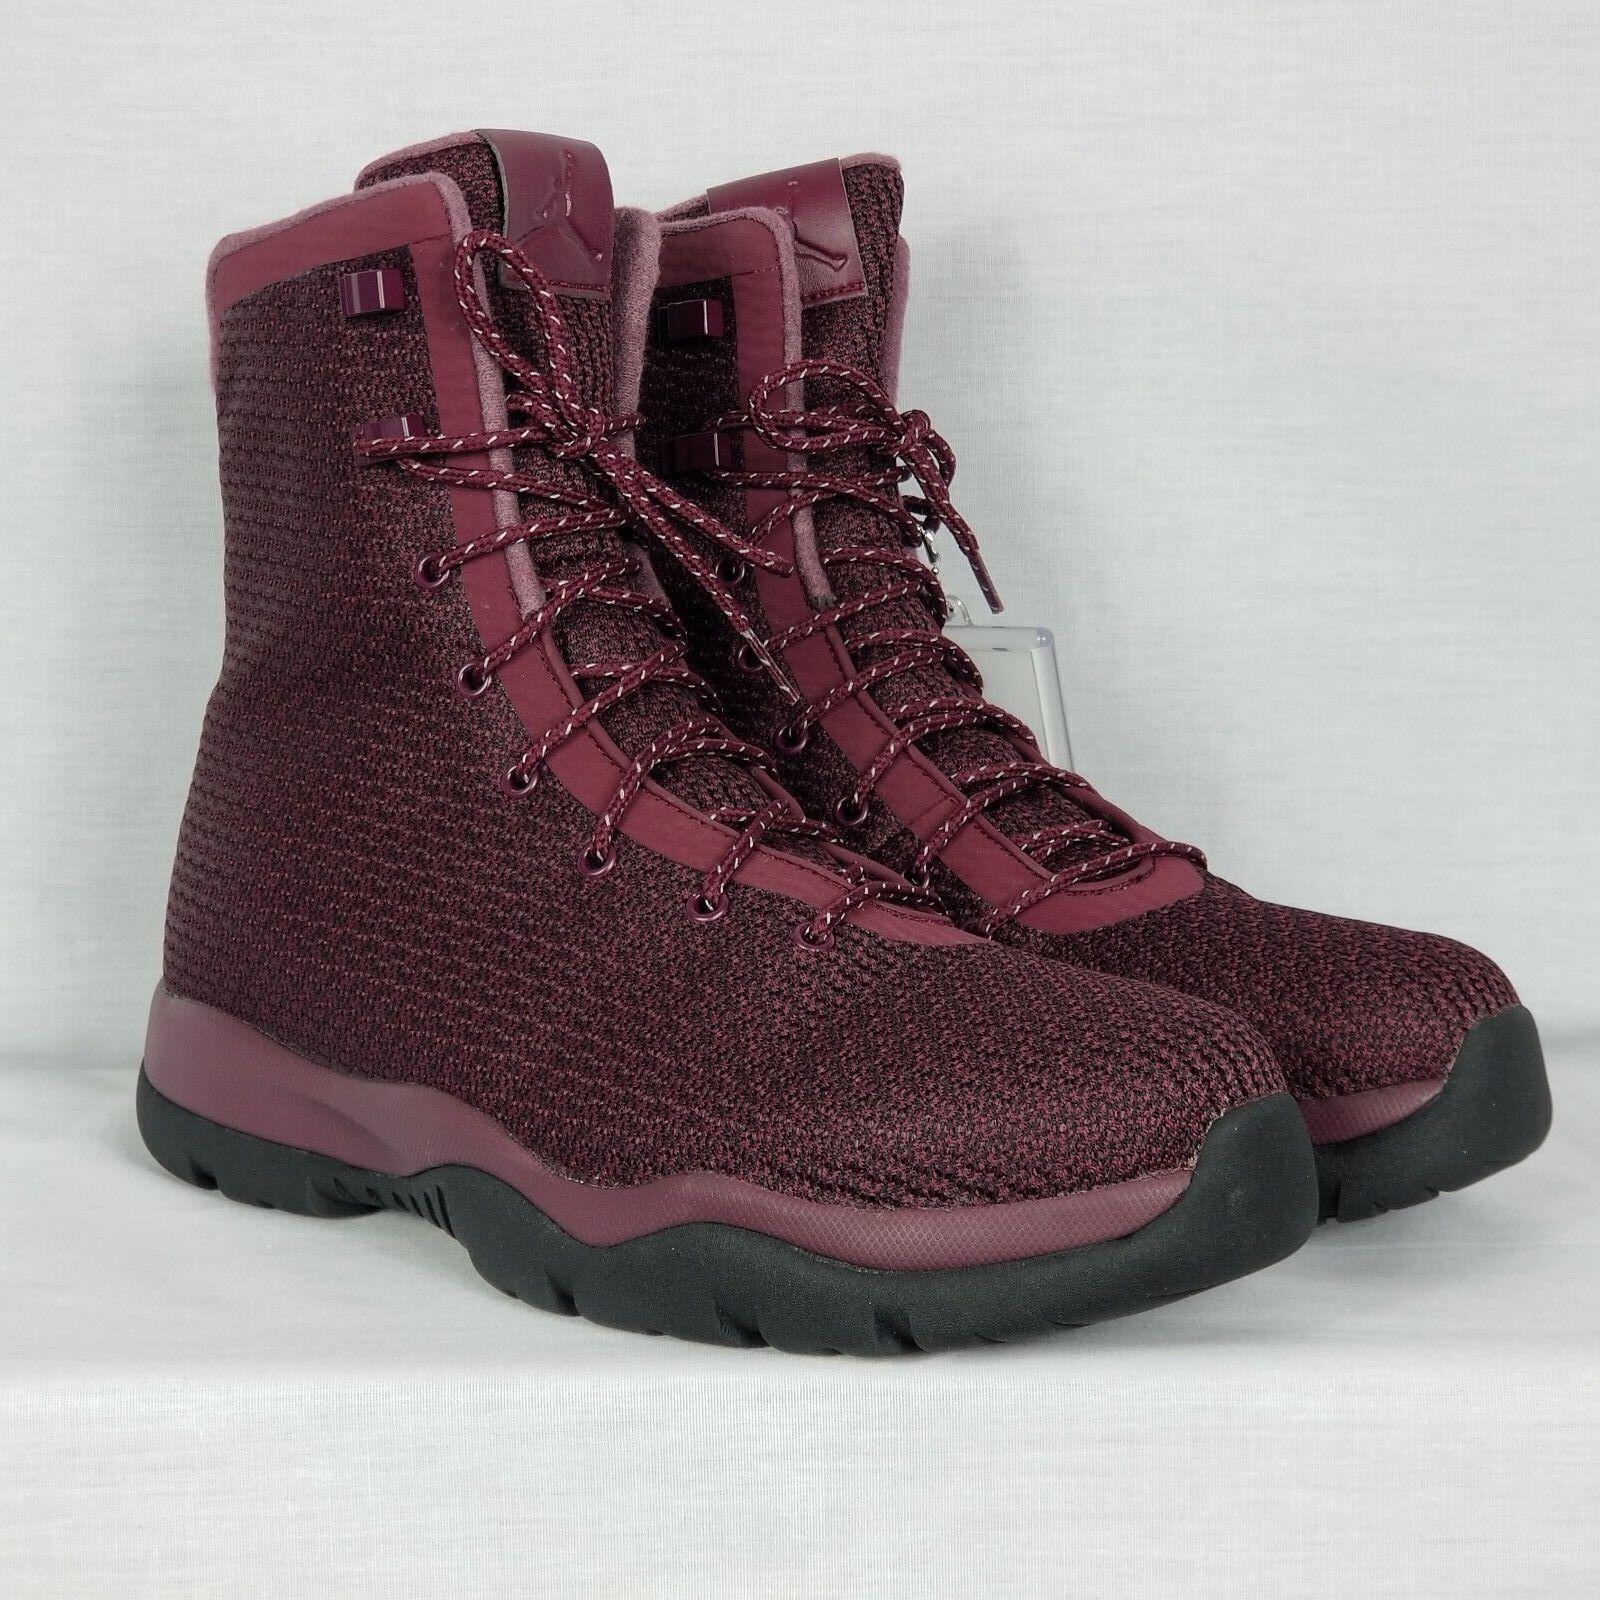 Nike Air Jordan Future Boot Sz 12 Night Maroon Burgundy Red Black 854554-600 Great discount